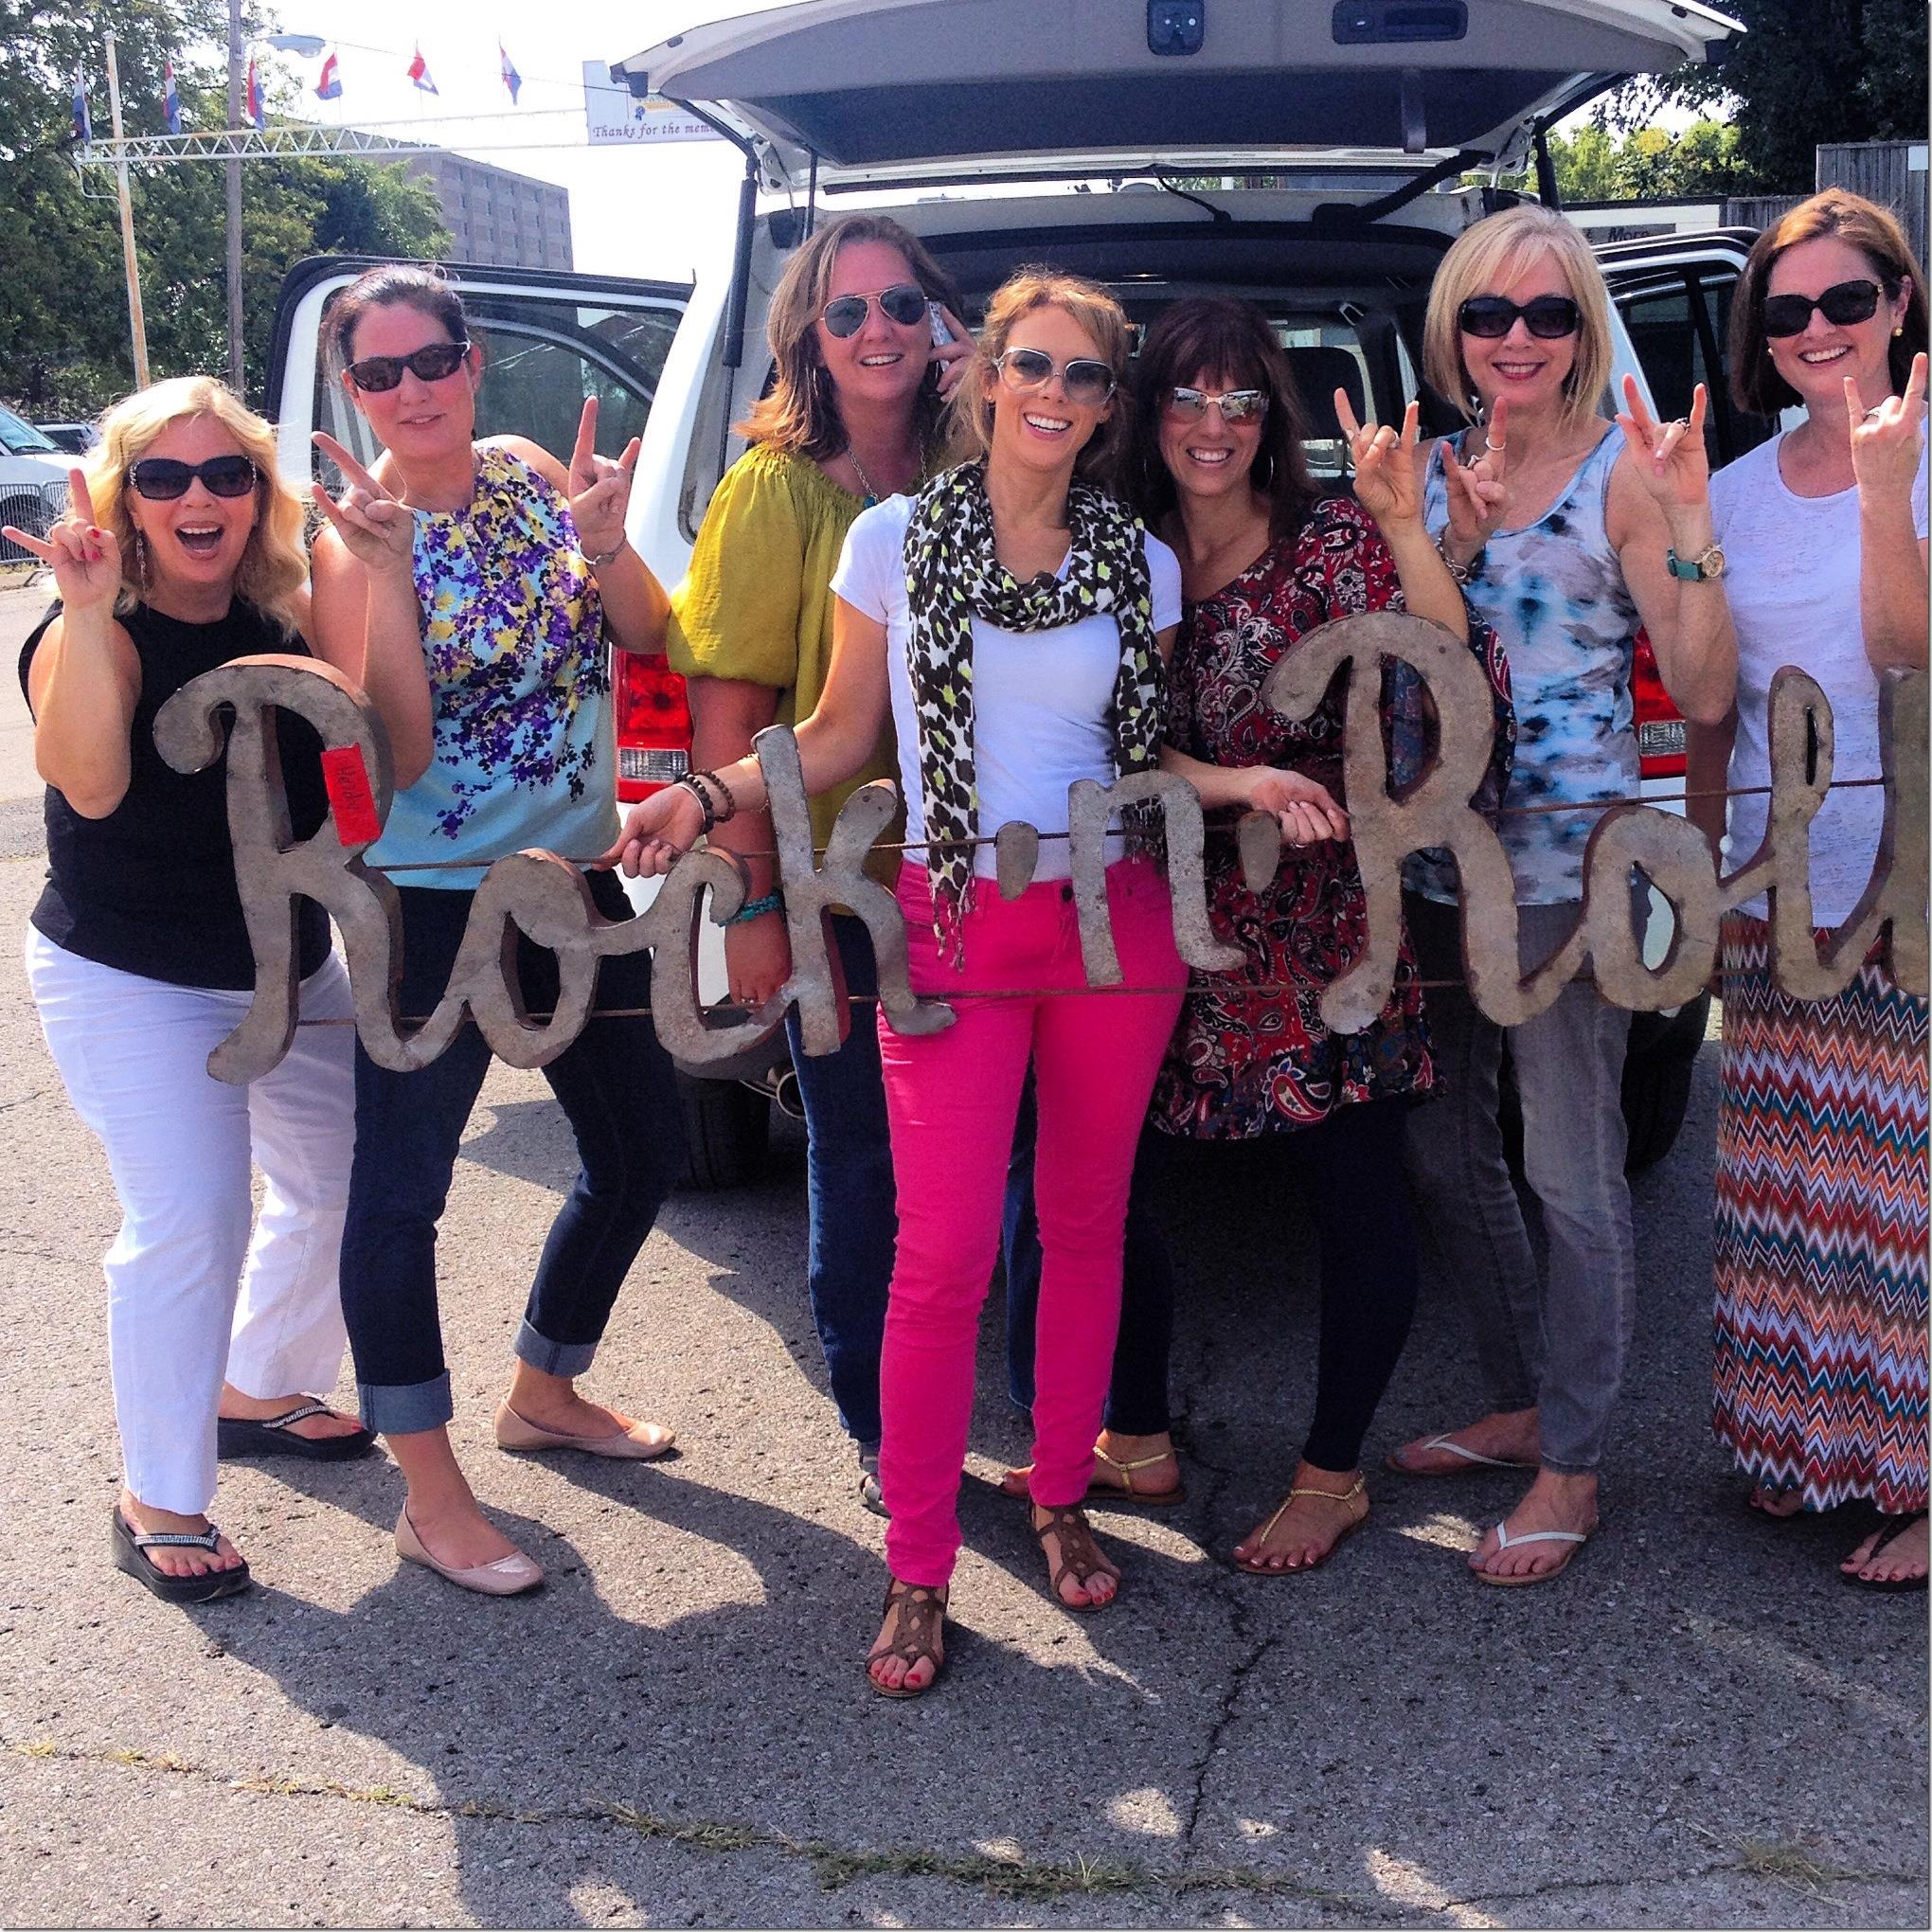 The Nashville ladies love a little rock n' roll in Nashville.